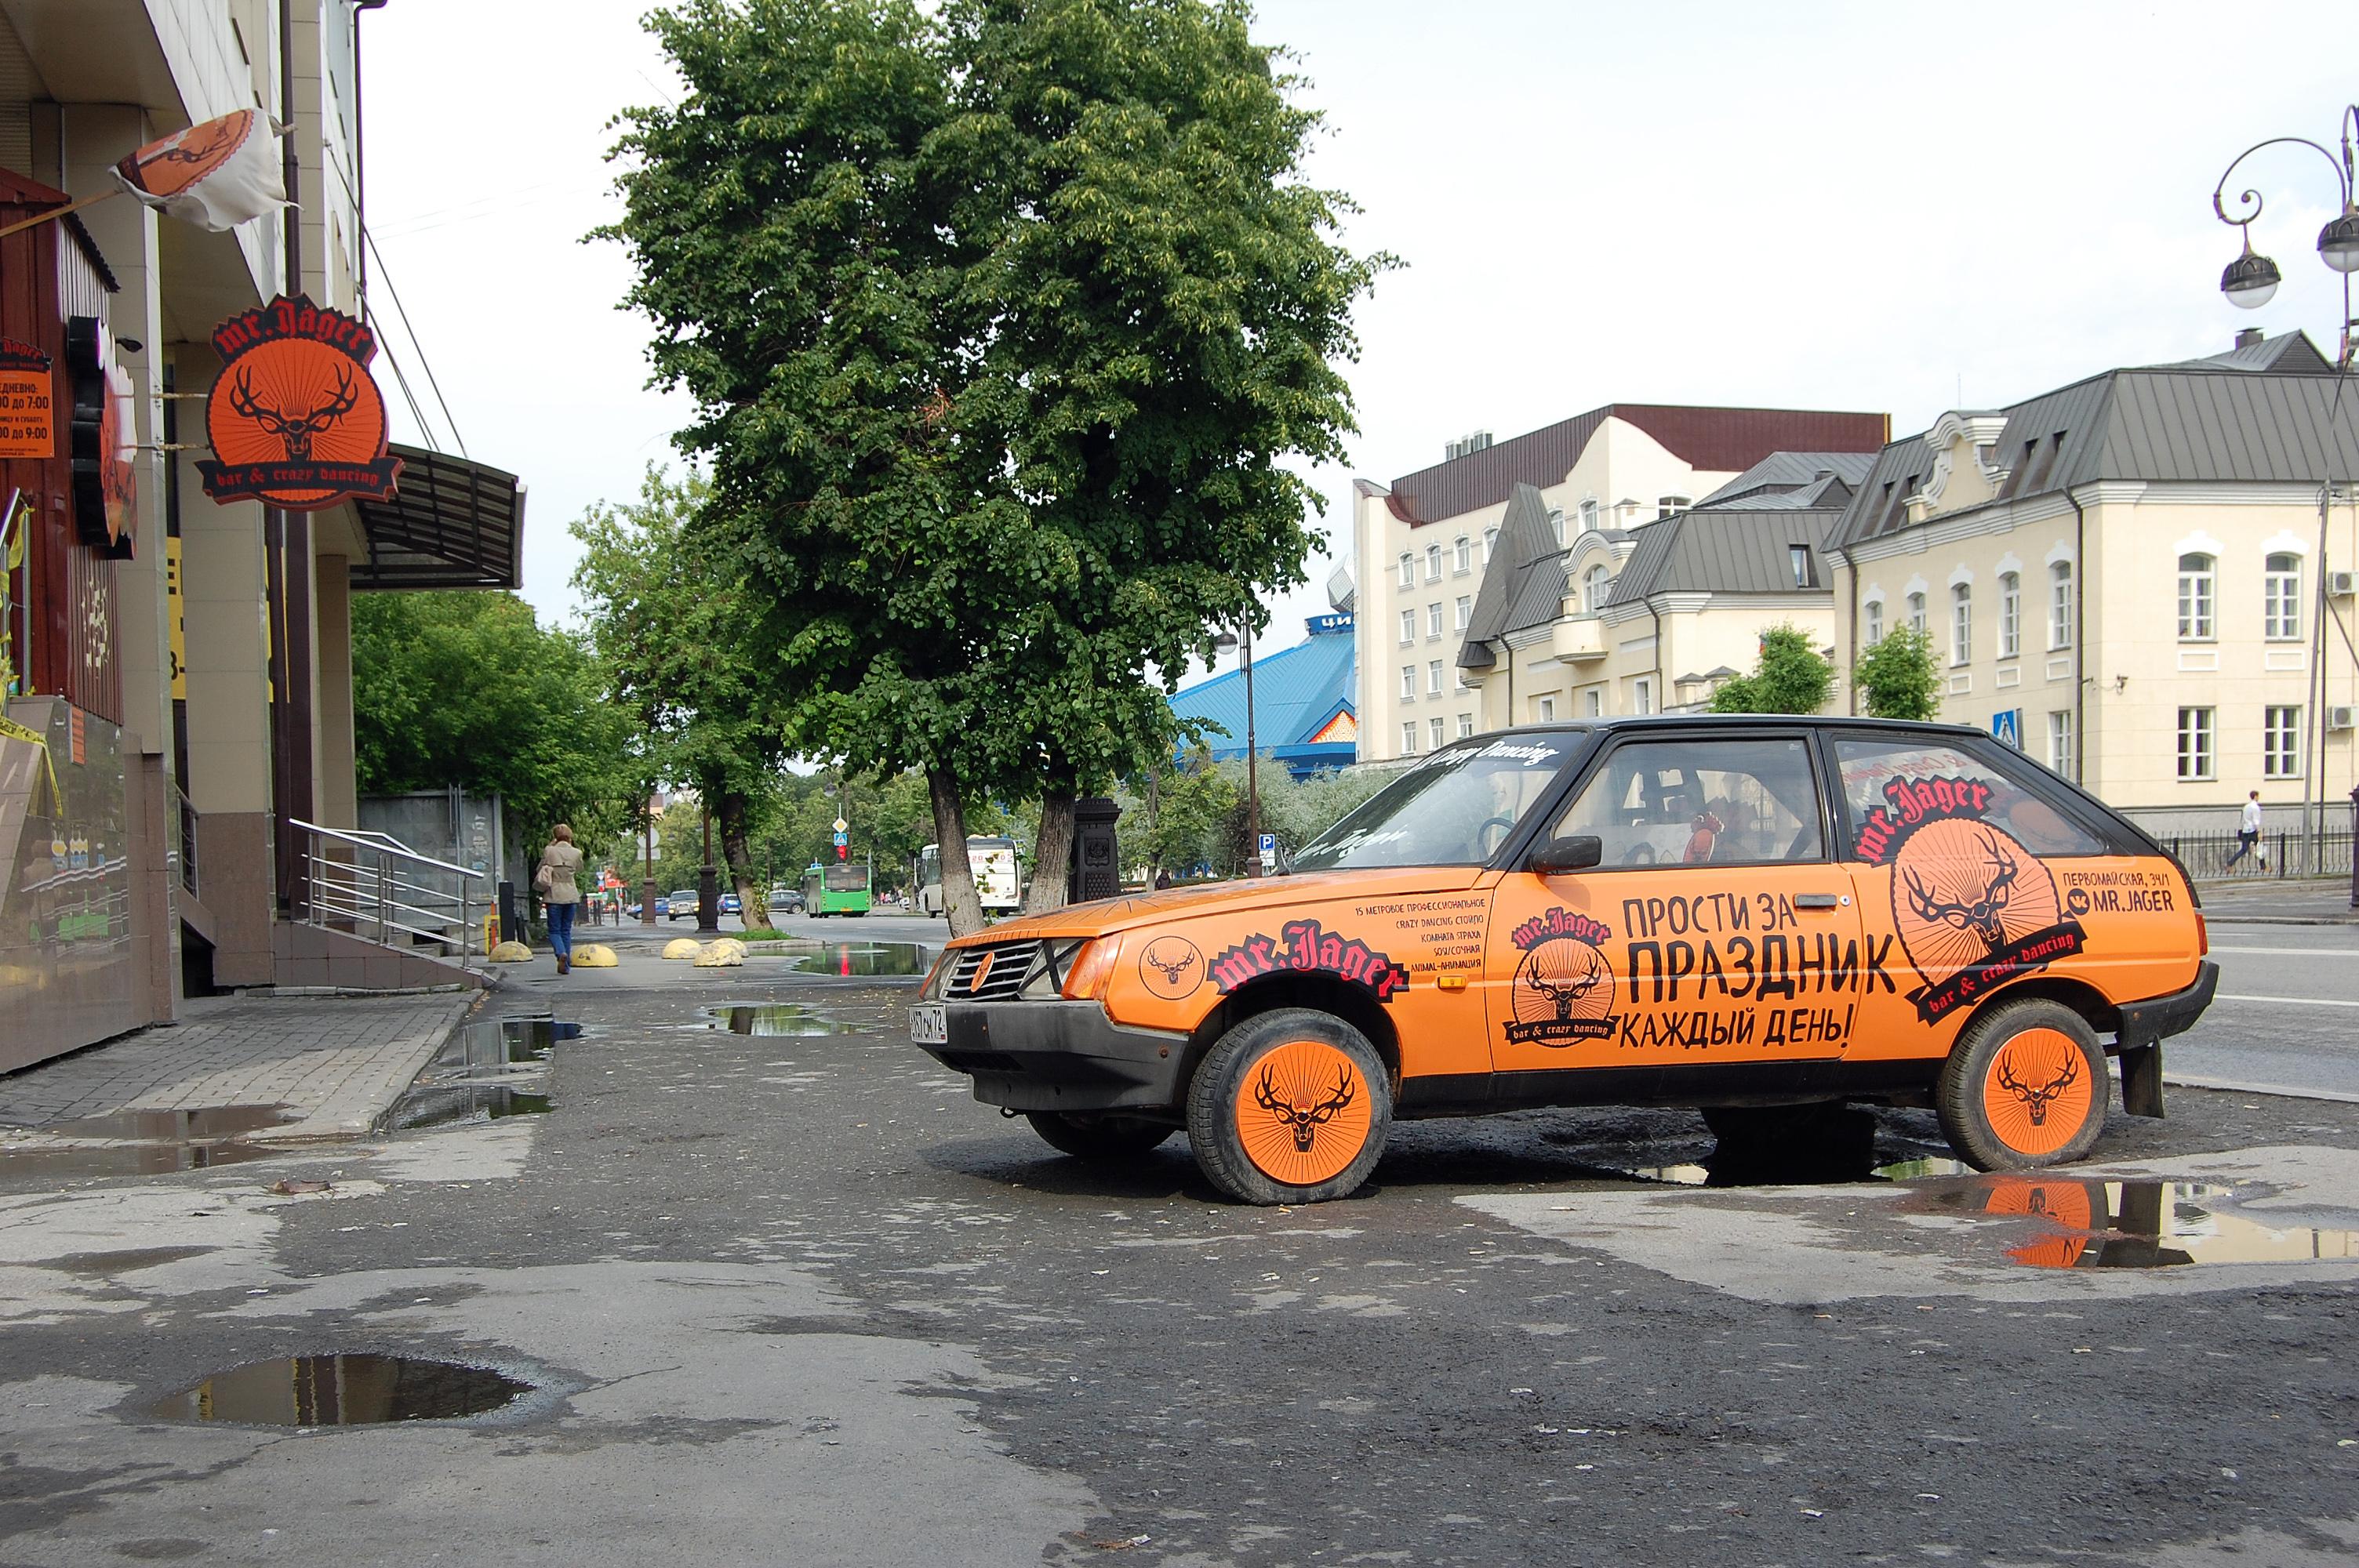 http://sf.uploads.ru/GX8v5.jpg